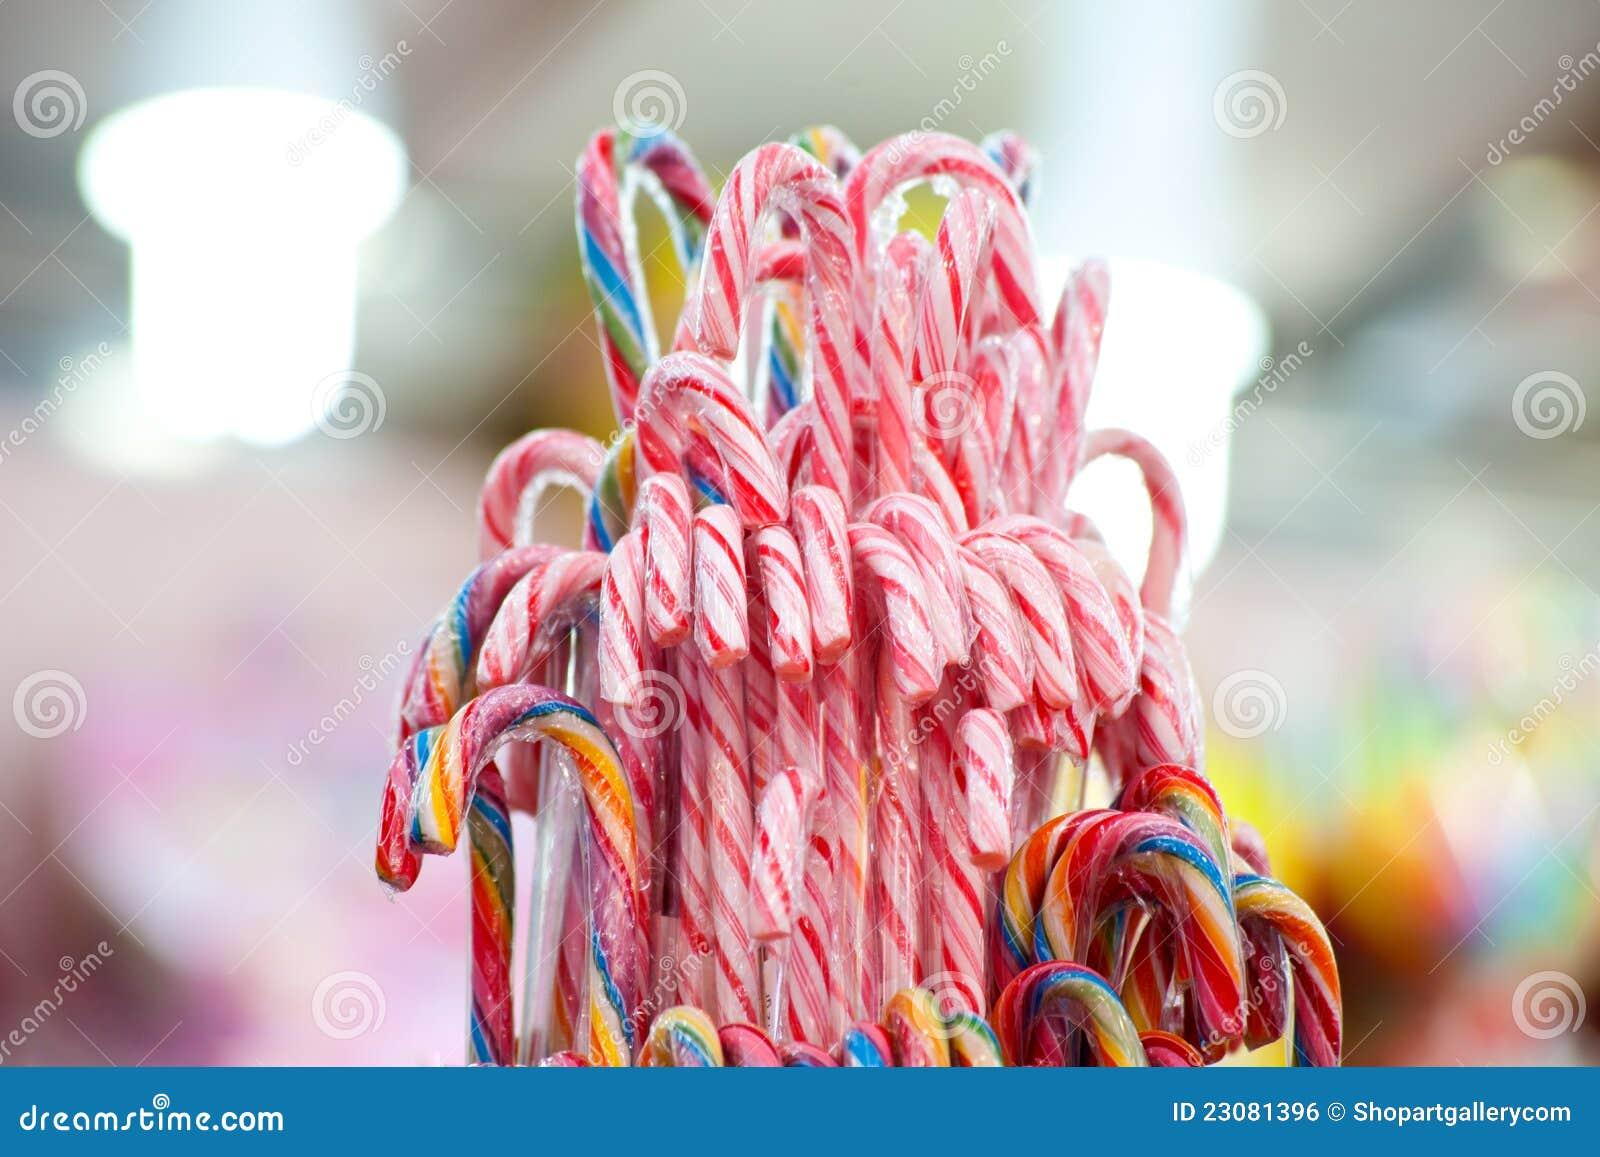 christmas candy canes in bulk - Bulk Christmas Candy